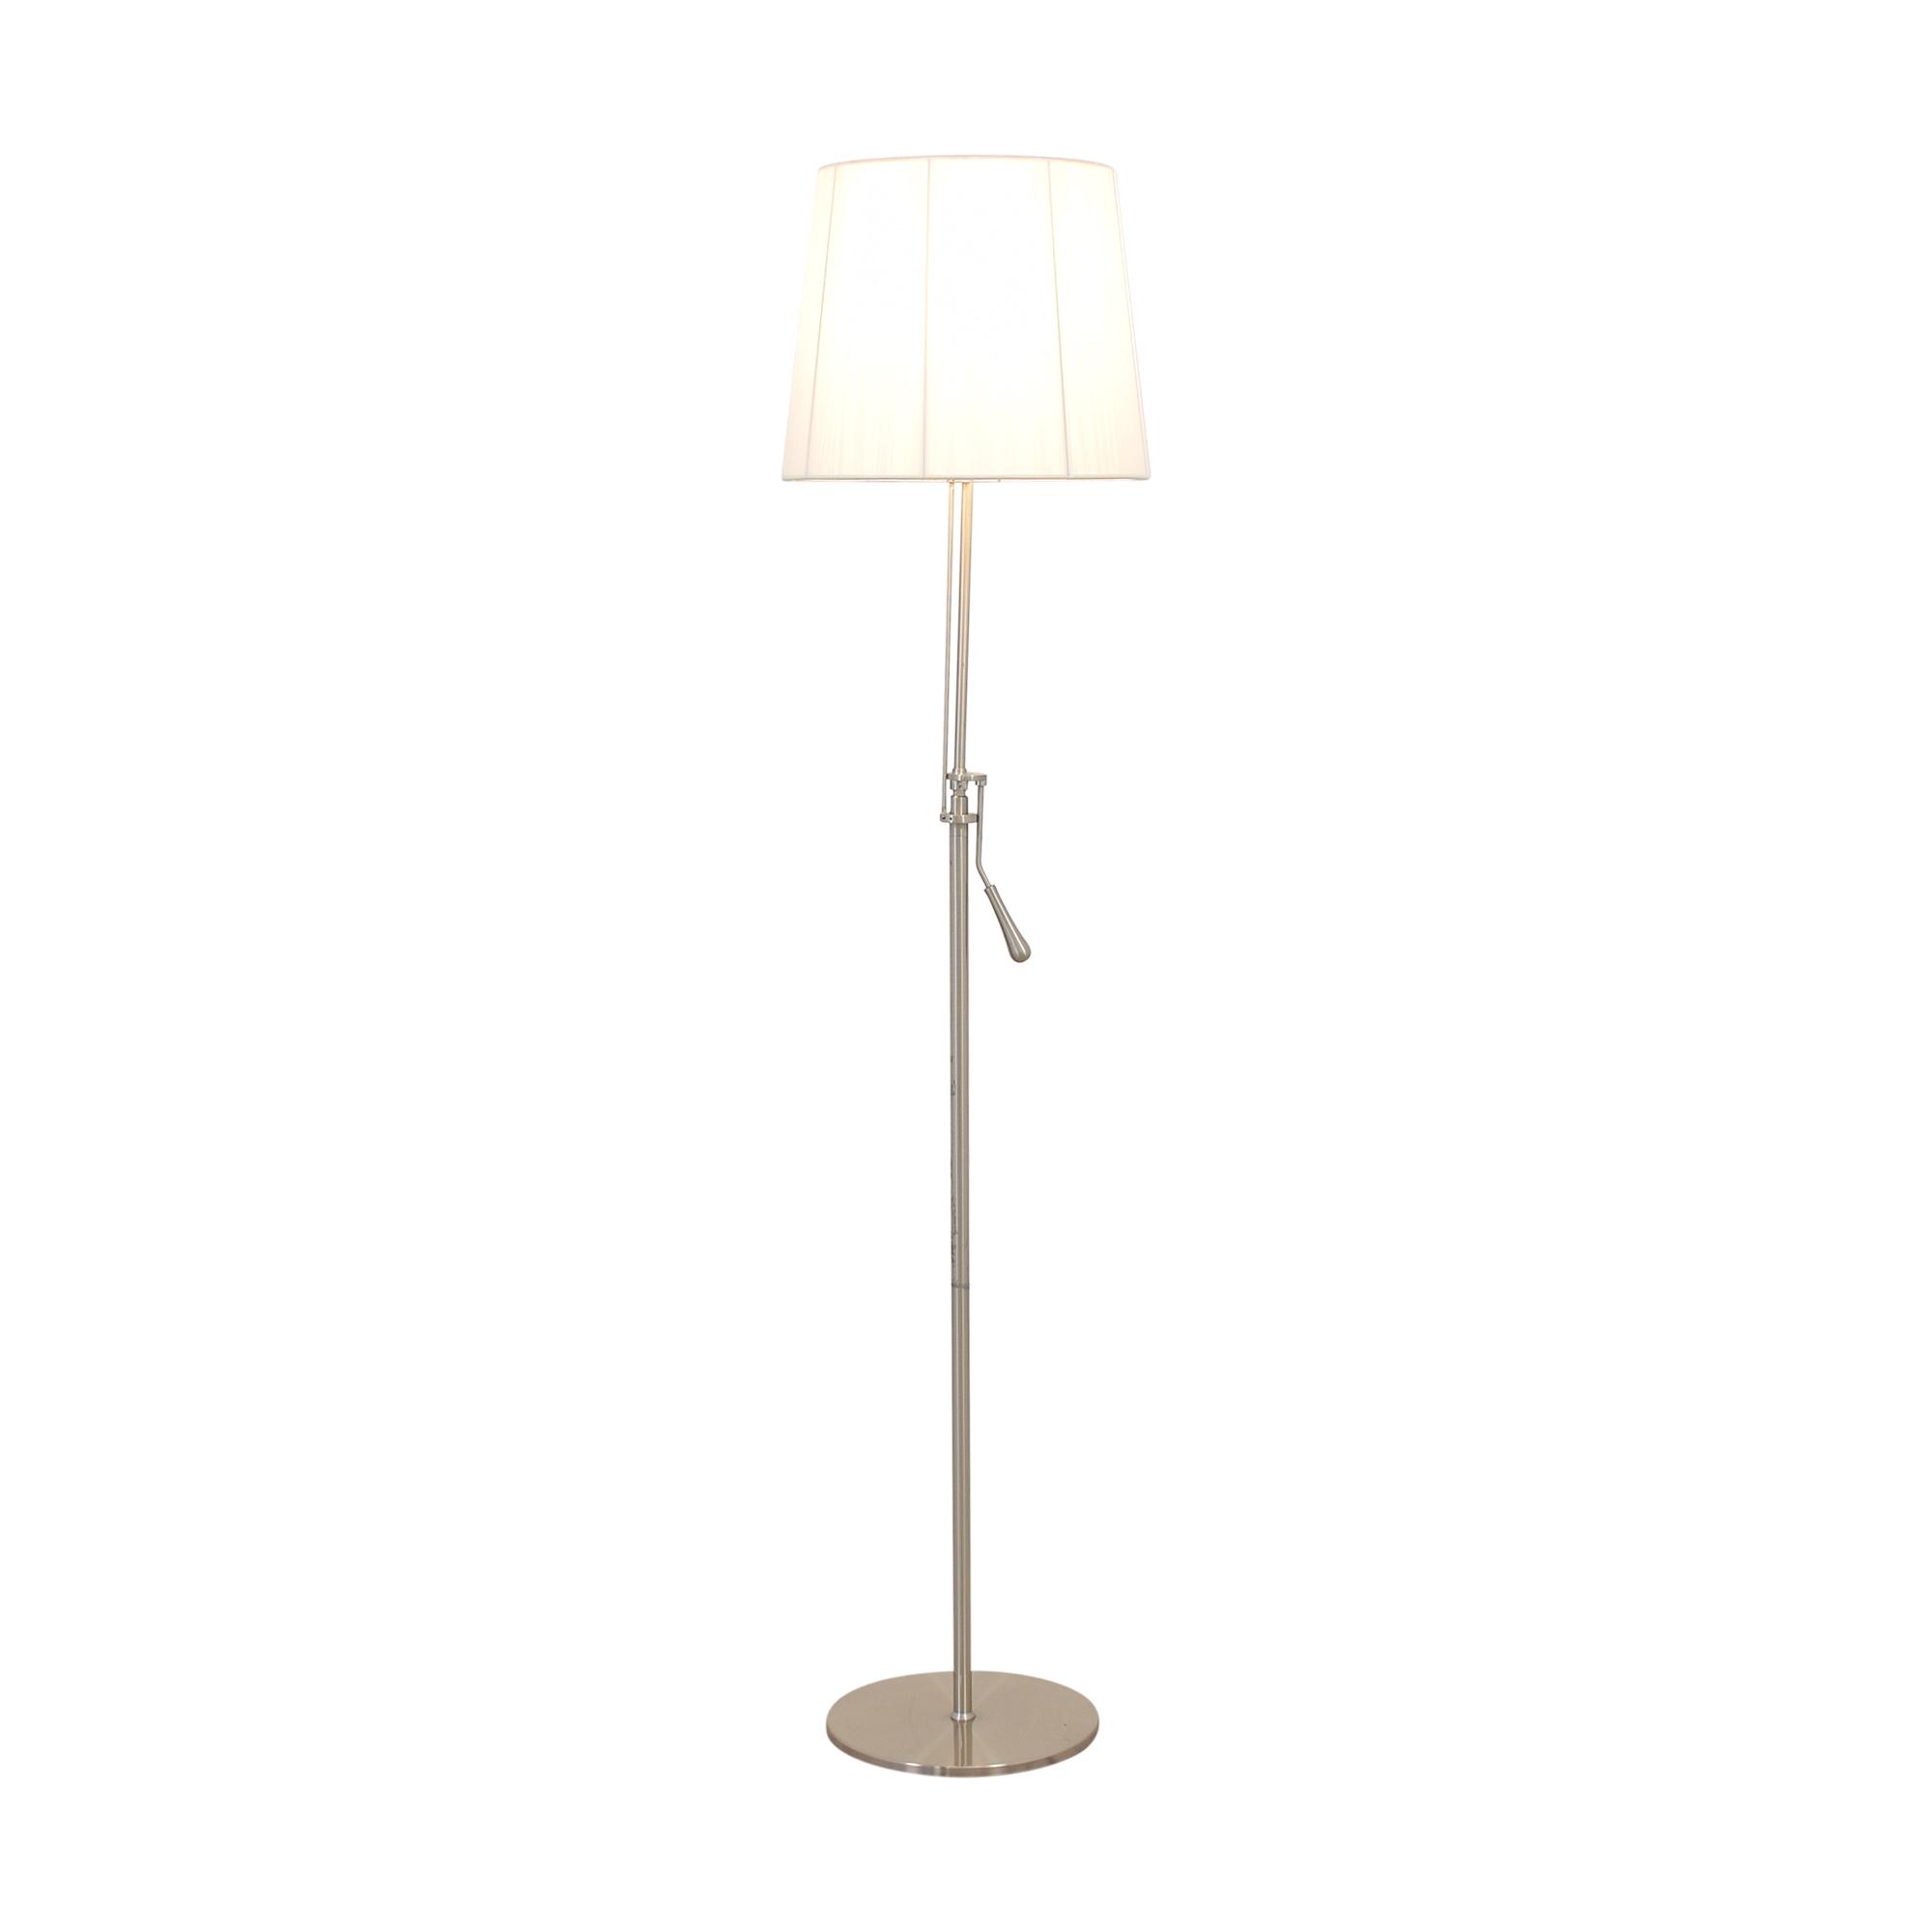 Gracious Home Gracious Home Swing Arm Floor Lamp dimensions